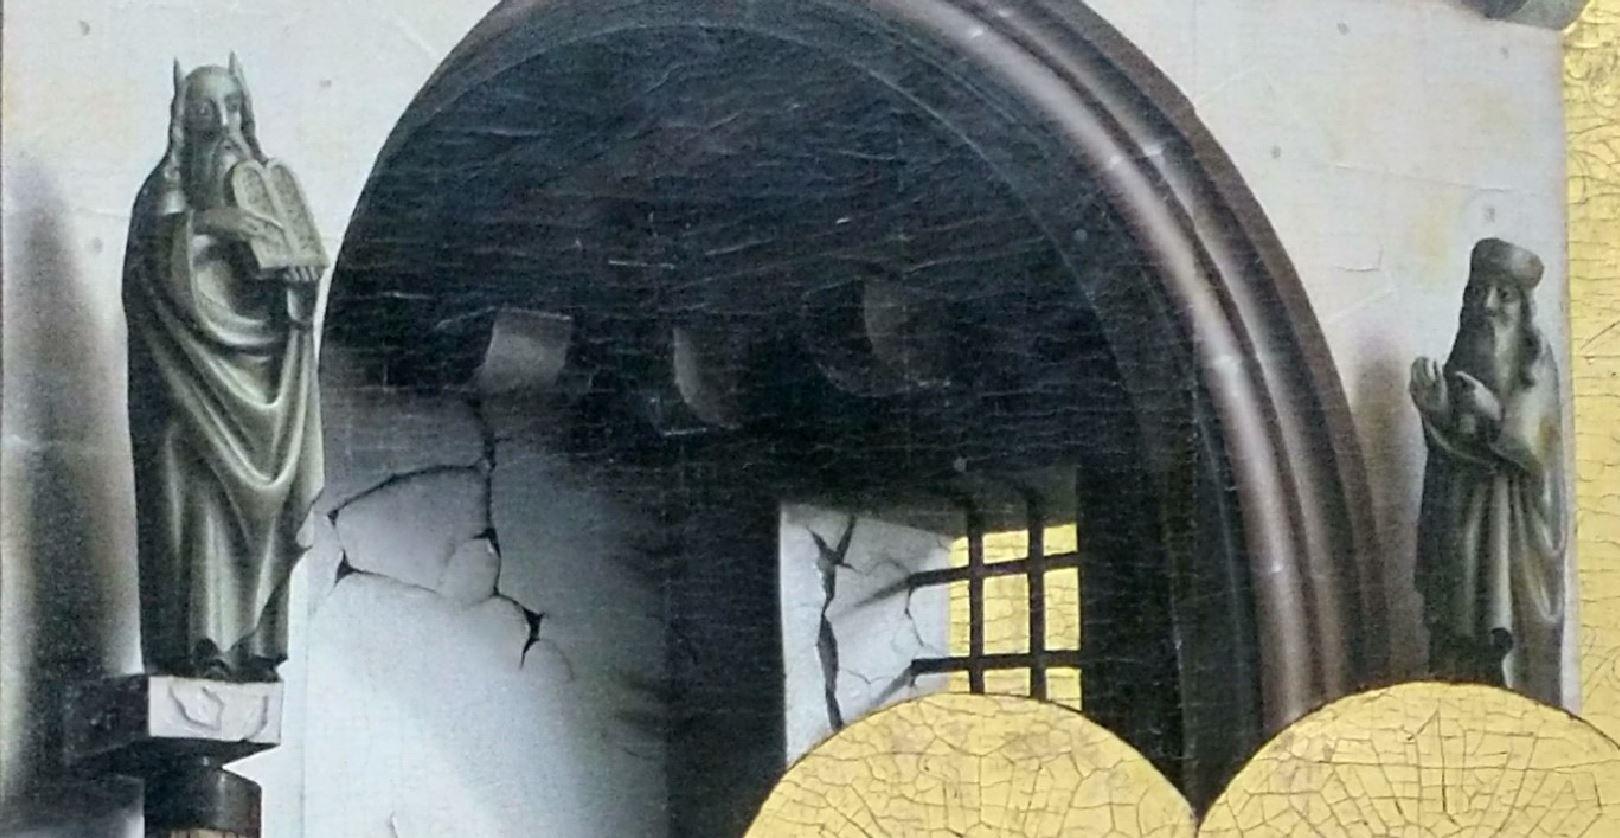 1437-40 Konrd Witz Porte doree Musee des BA Bale statuettes